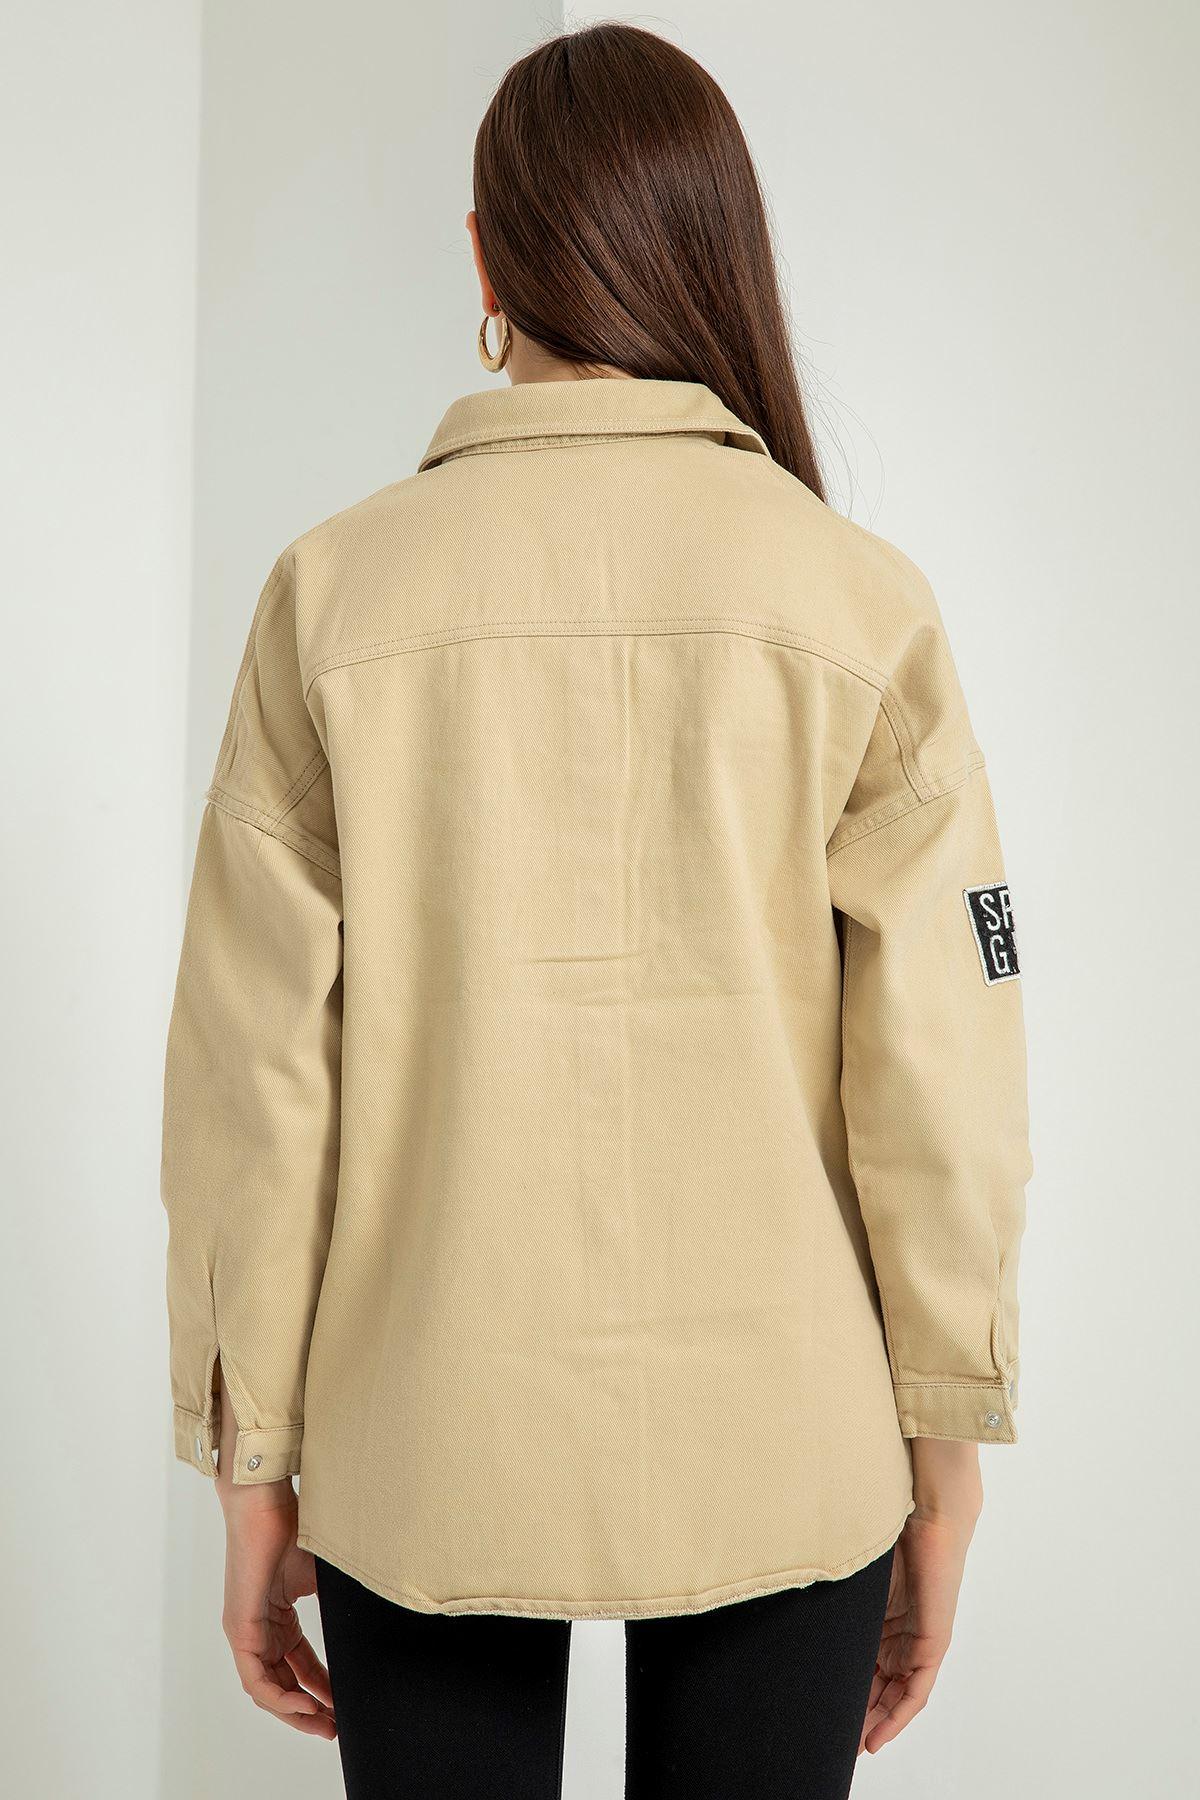 Cepli Yırtık Detay Kot Ceket-Bej